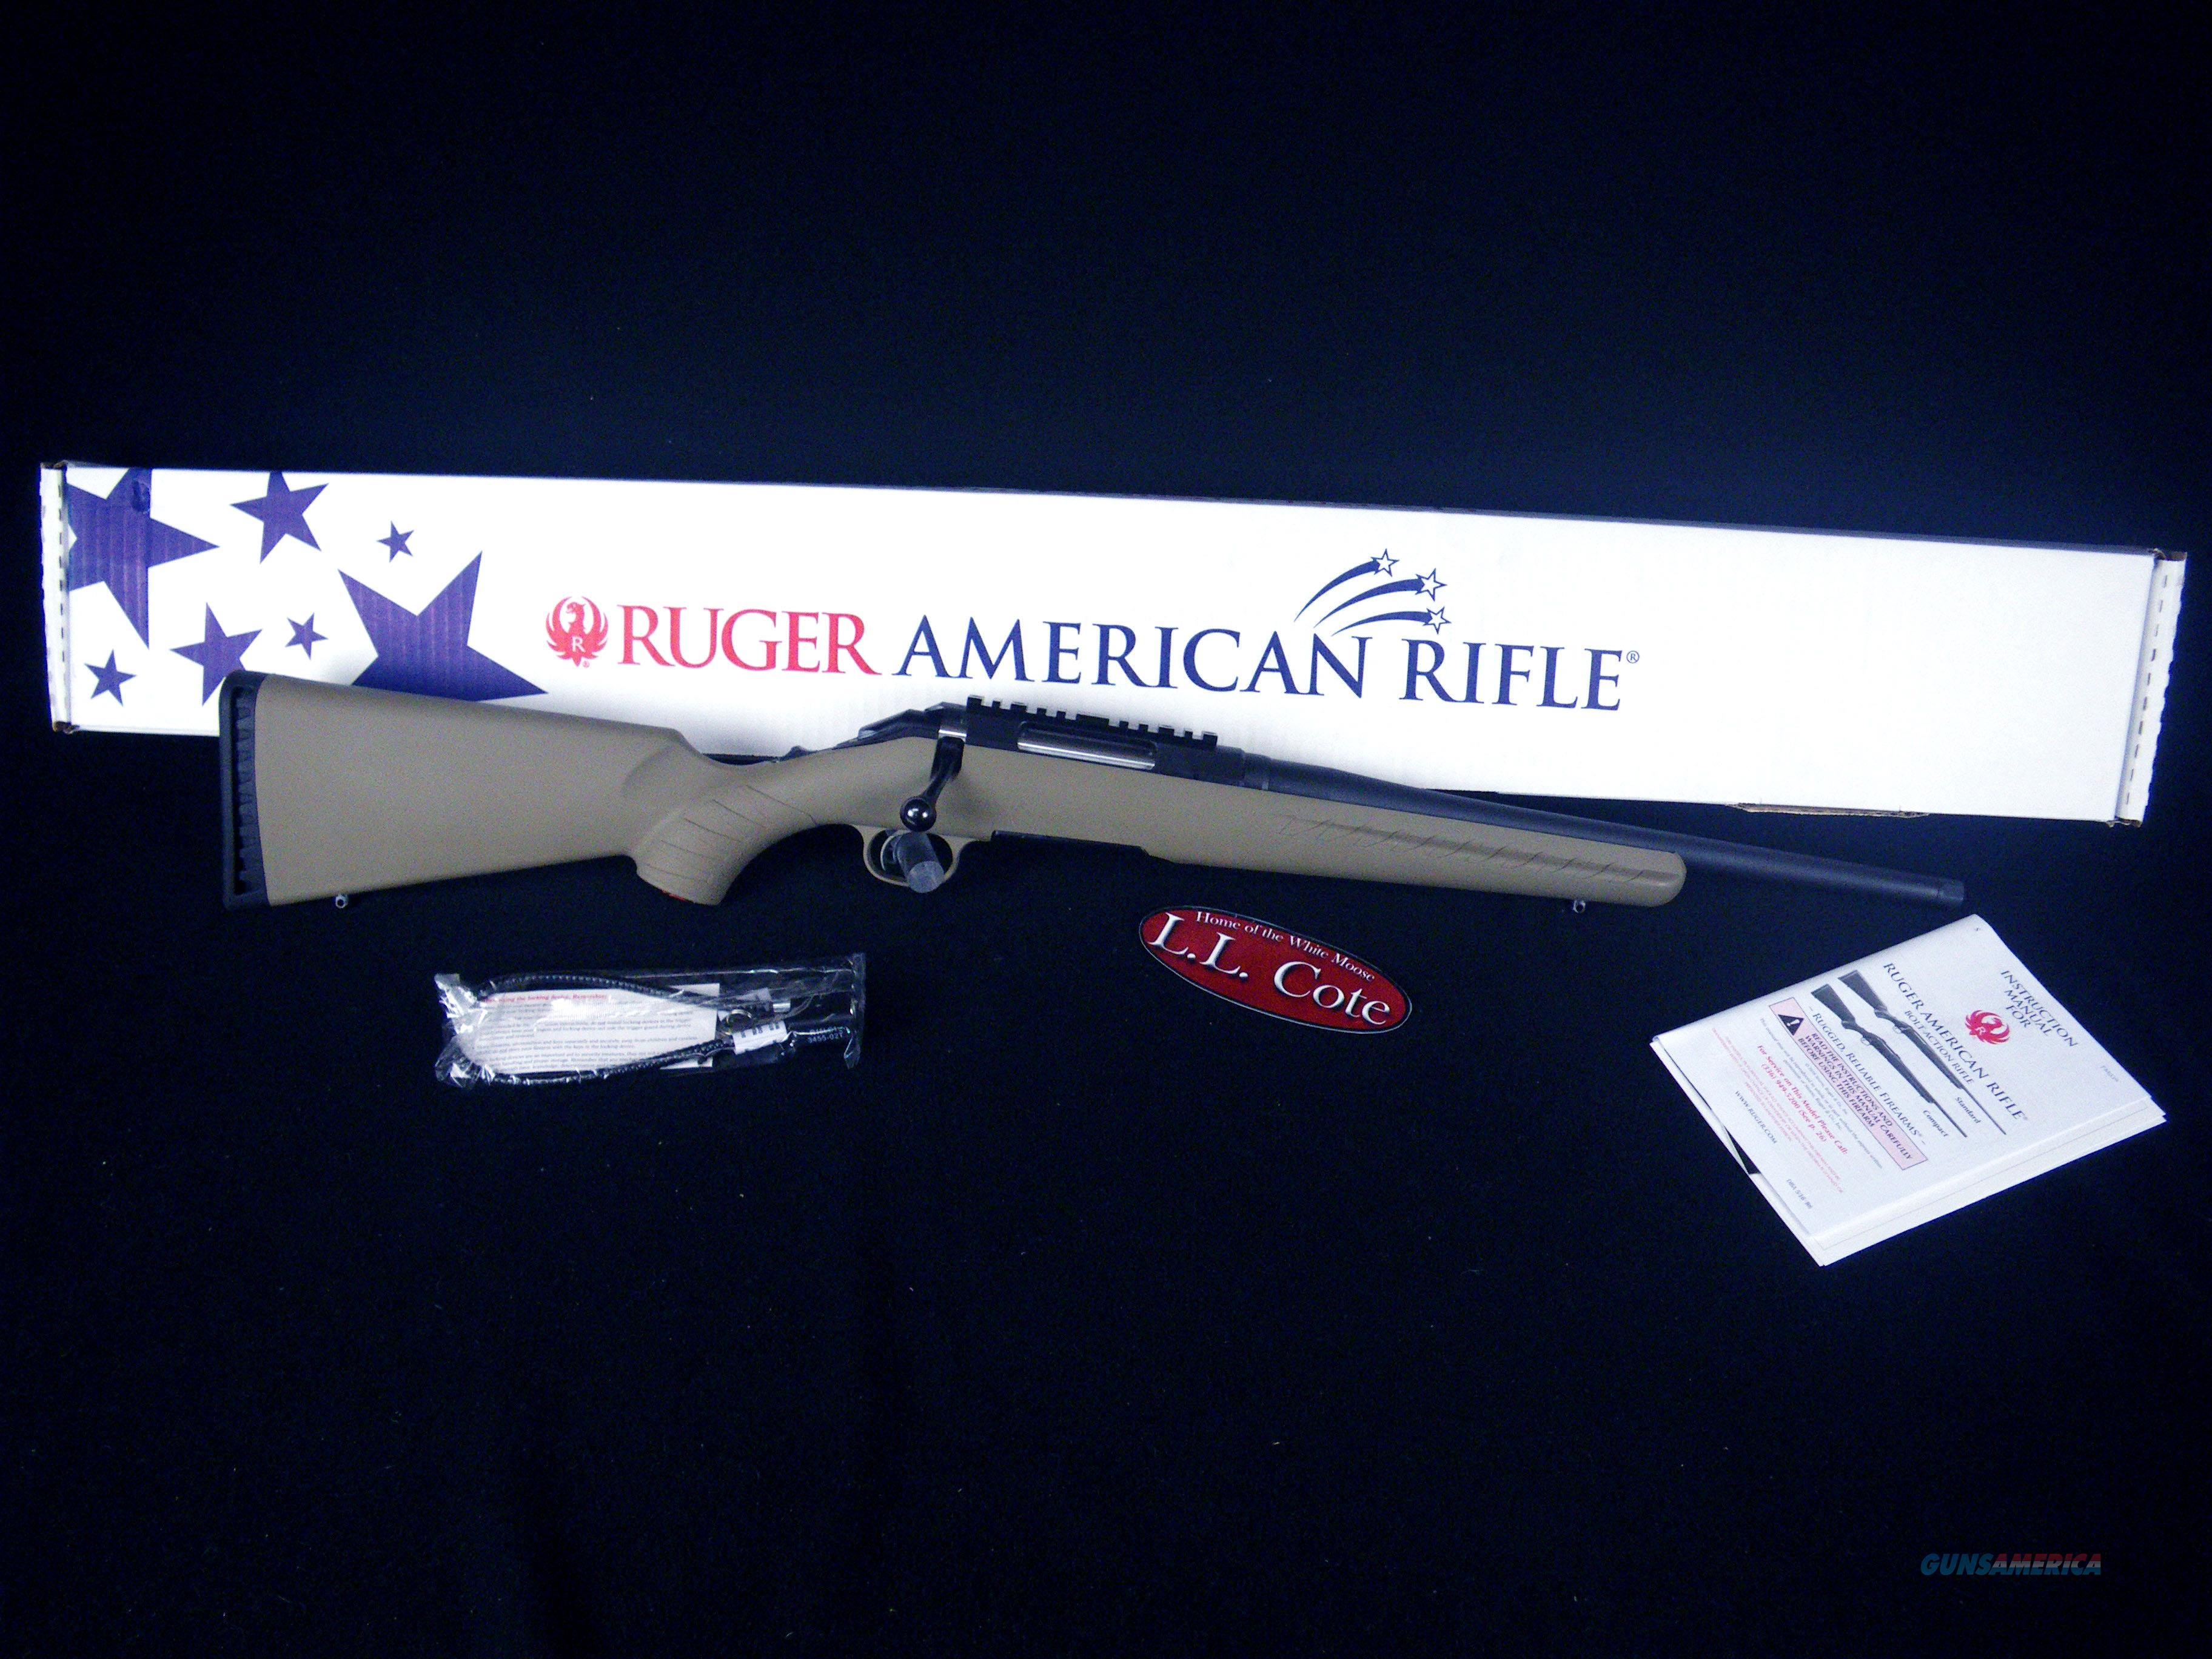 "Ruger American Rifle Ranch 300 Blk 16"" NEW 6968  Guns > Rifles > Ruger Rifles > American Rifle"